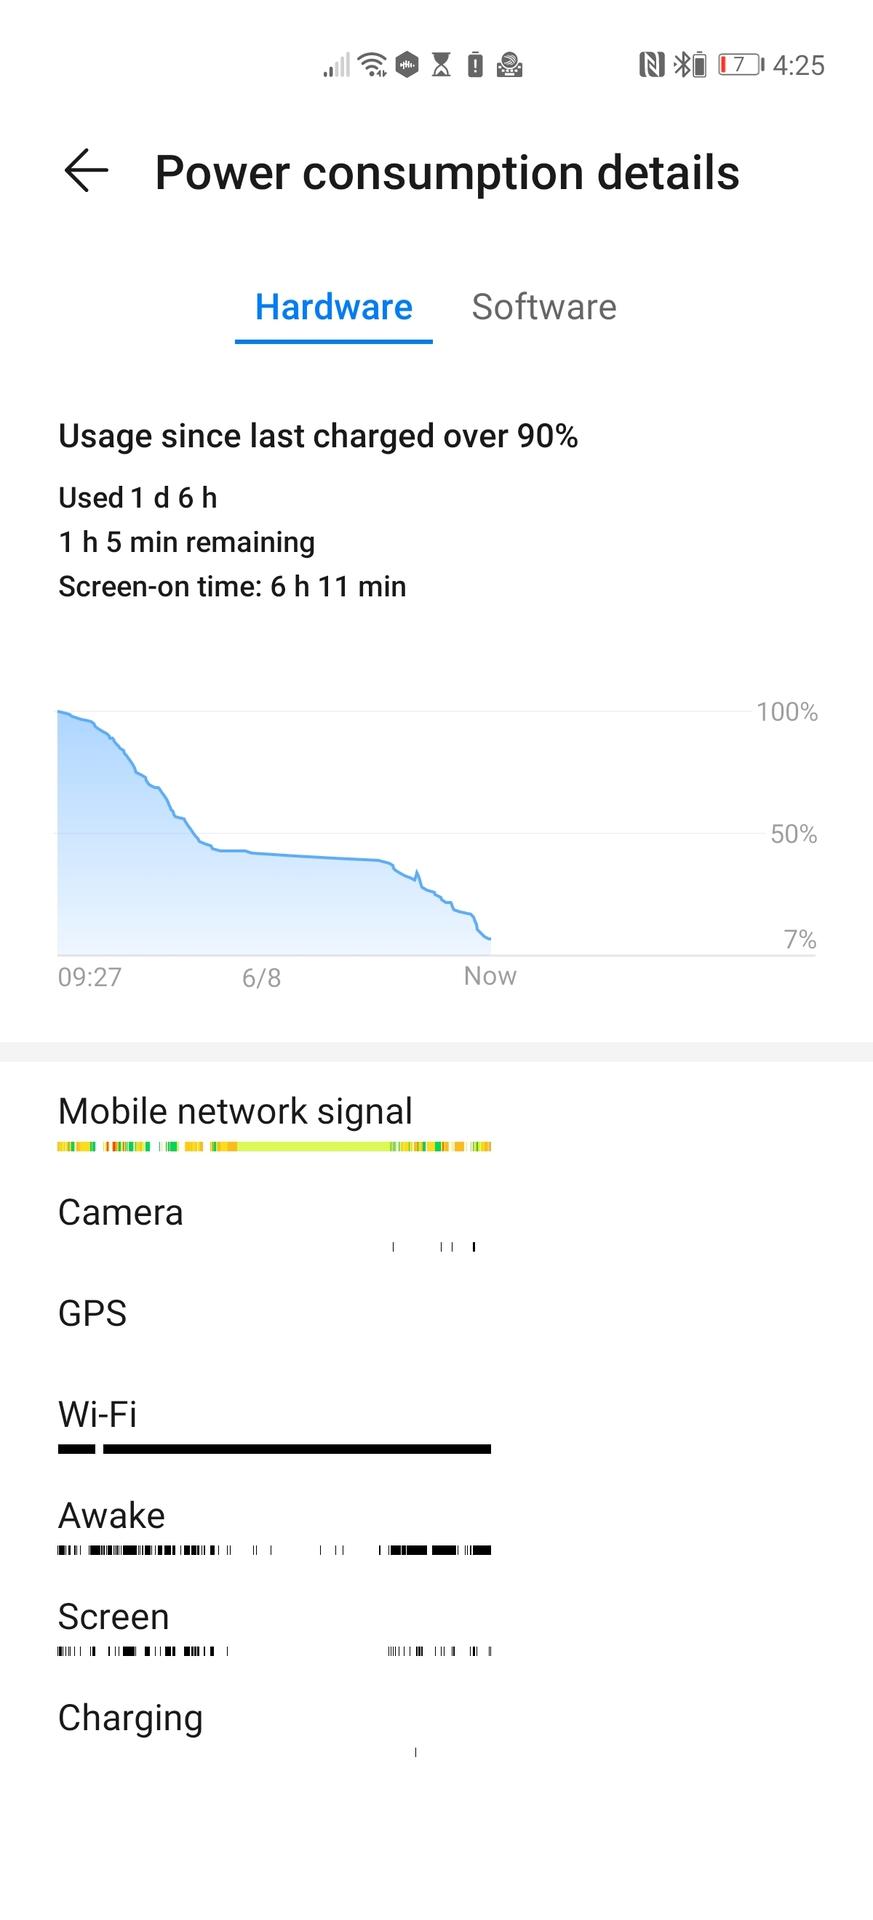 Huawei P40 Pro Plus hardware battery consumption